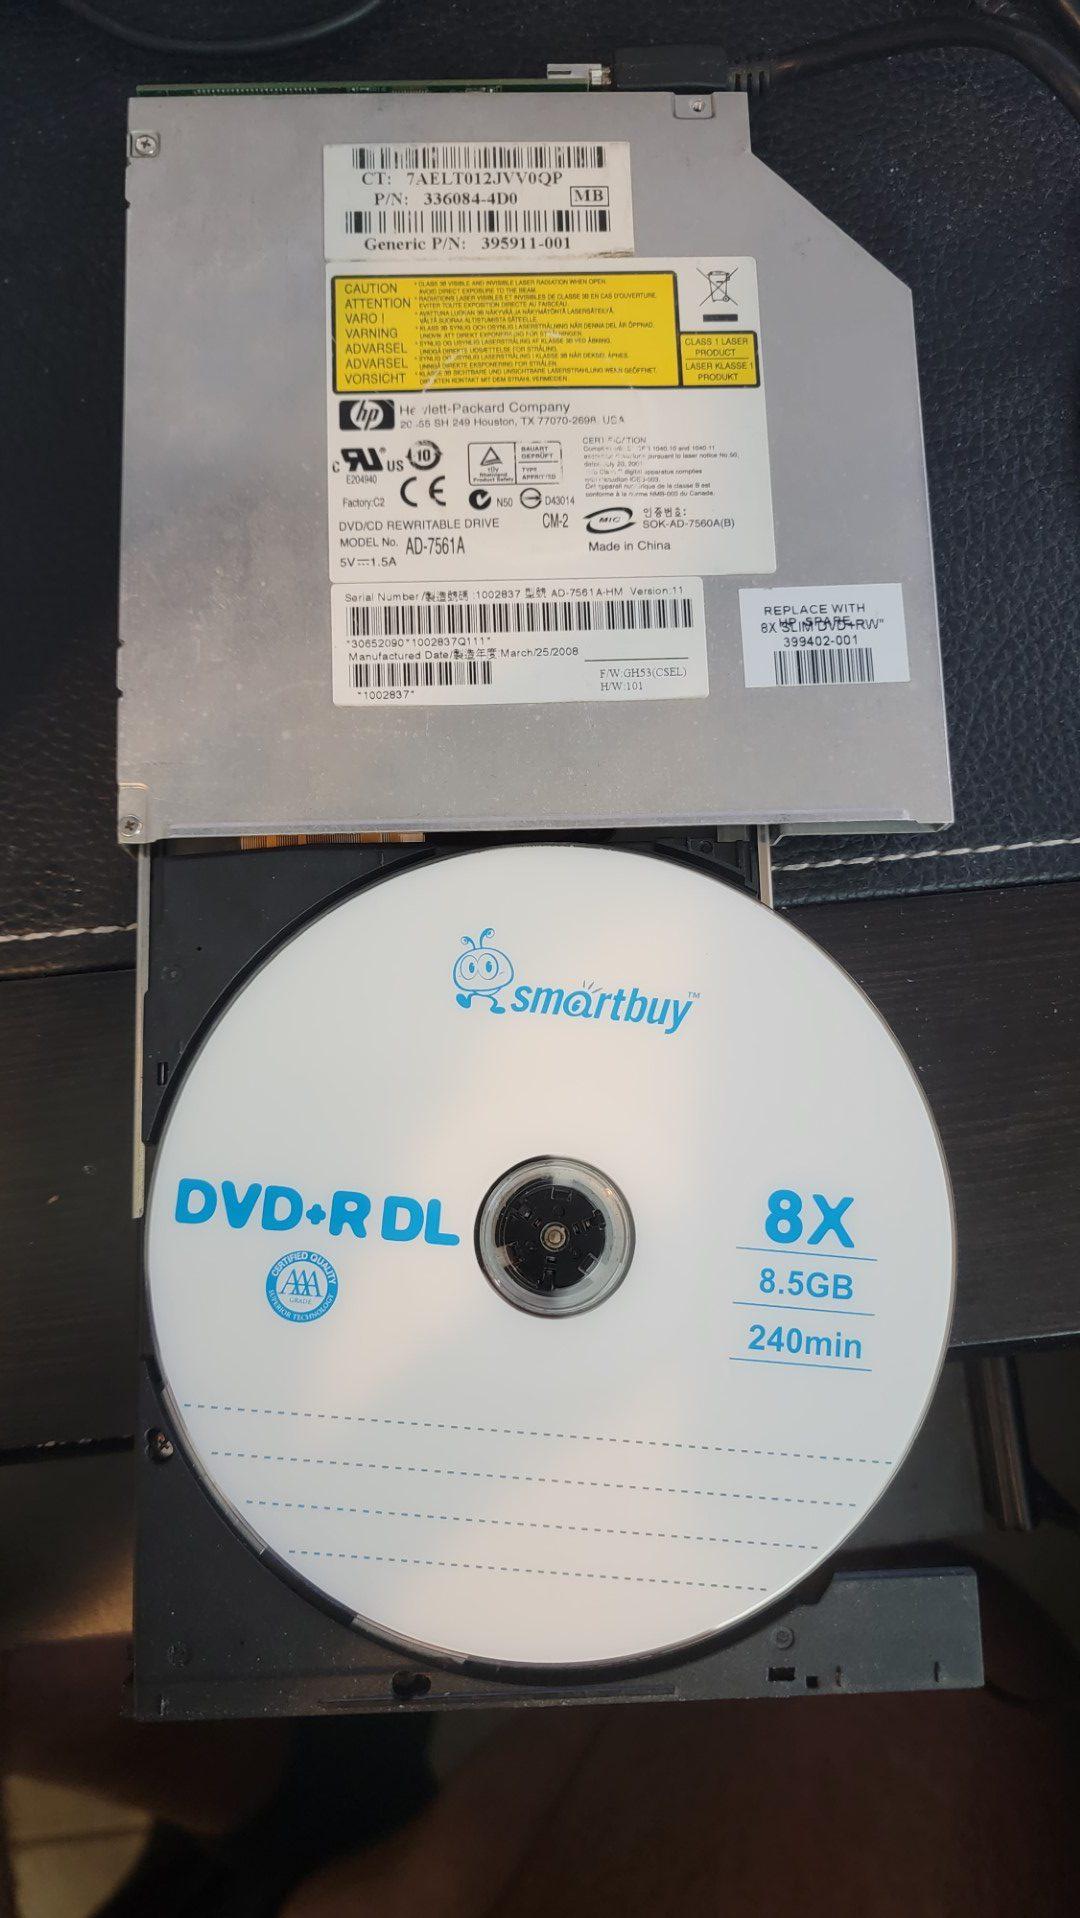 Optiarc AD-7561A with SmartBuy DVD+R DL